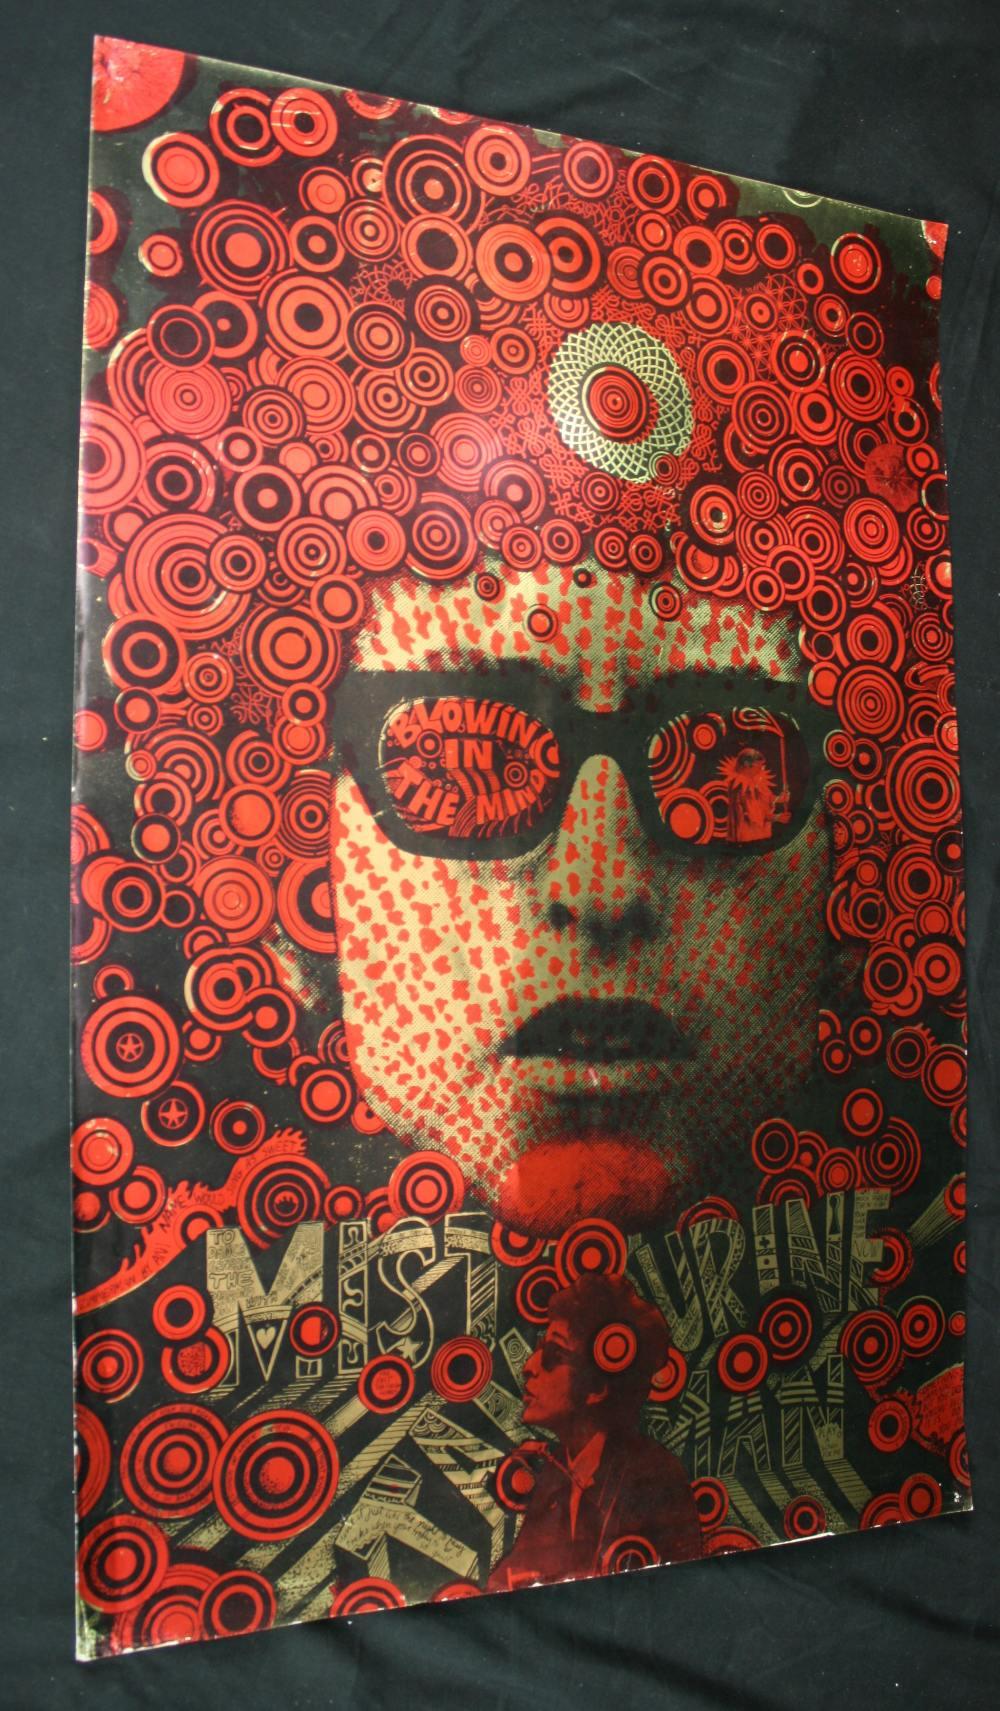 Bob Dylan Original Martin Sharp Blowing In The Mind Mr